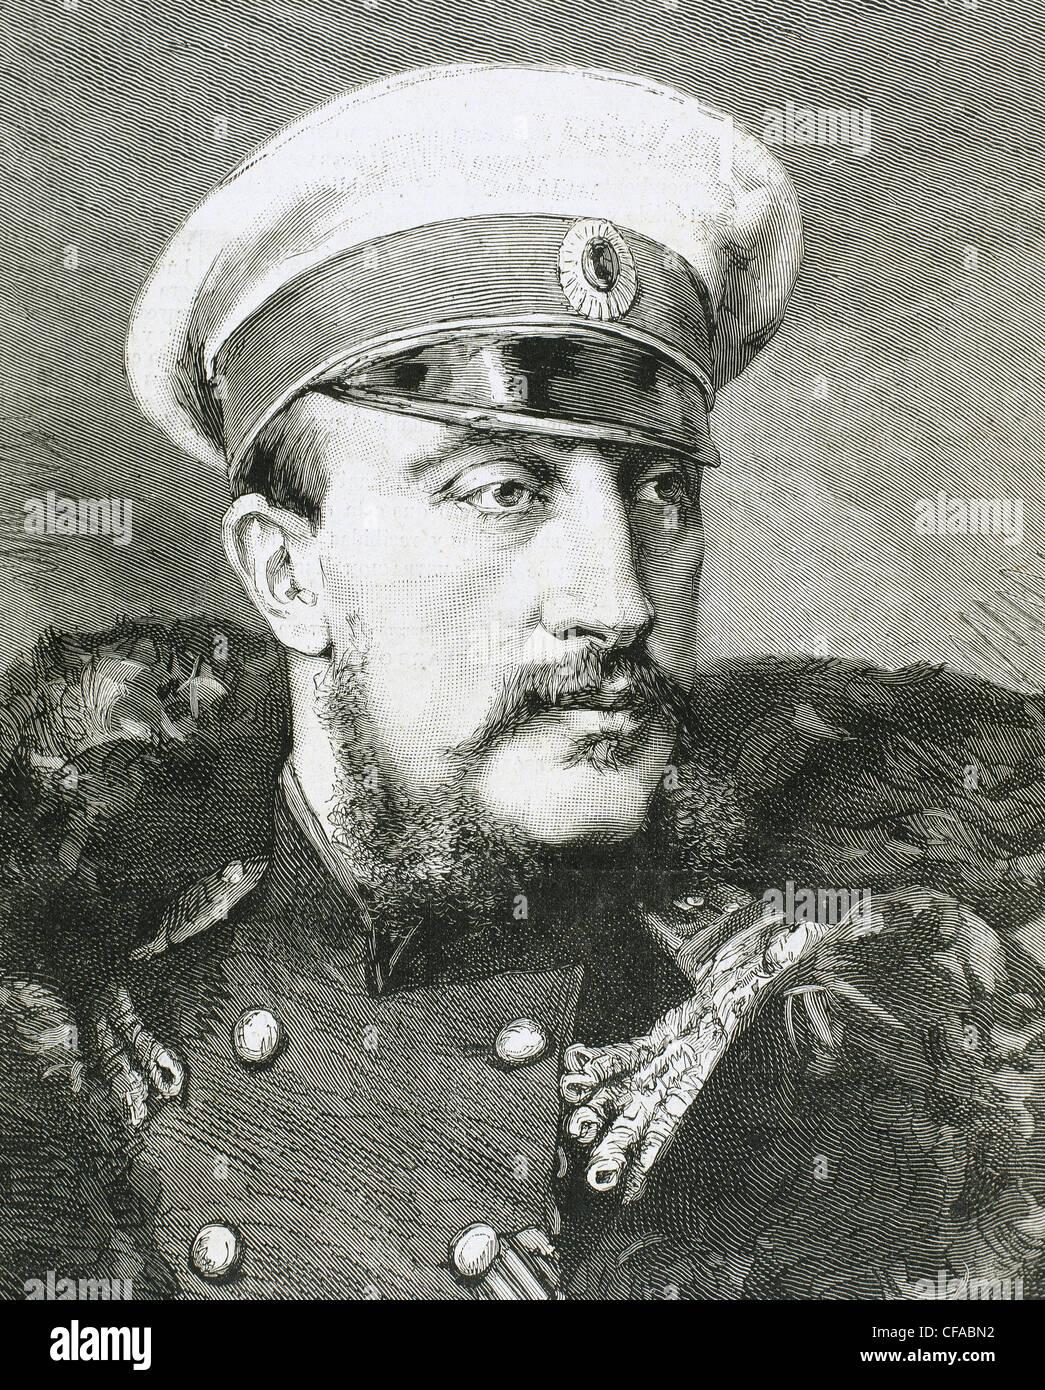 Grand Duke Konstantin Nikolayevich of Russia (1827-1892). Engraving. - Stock Image